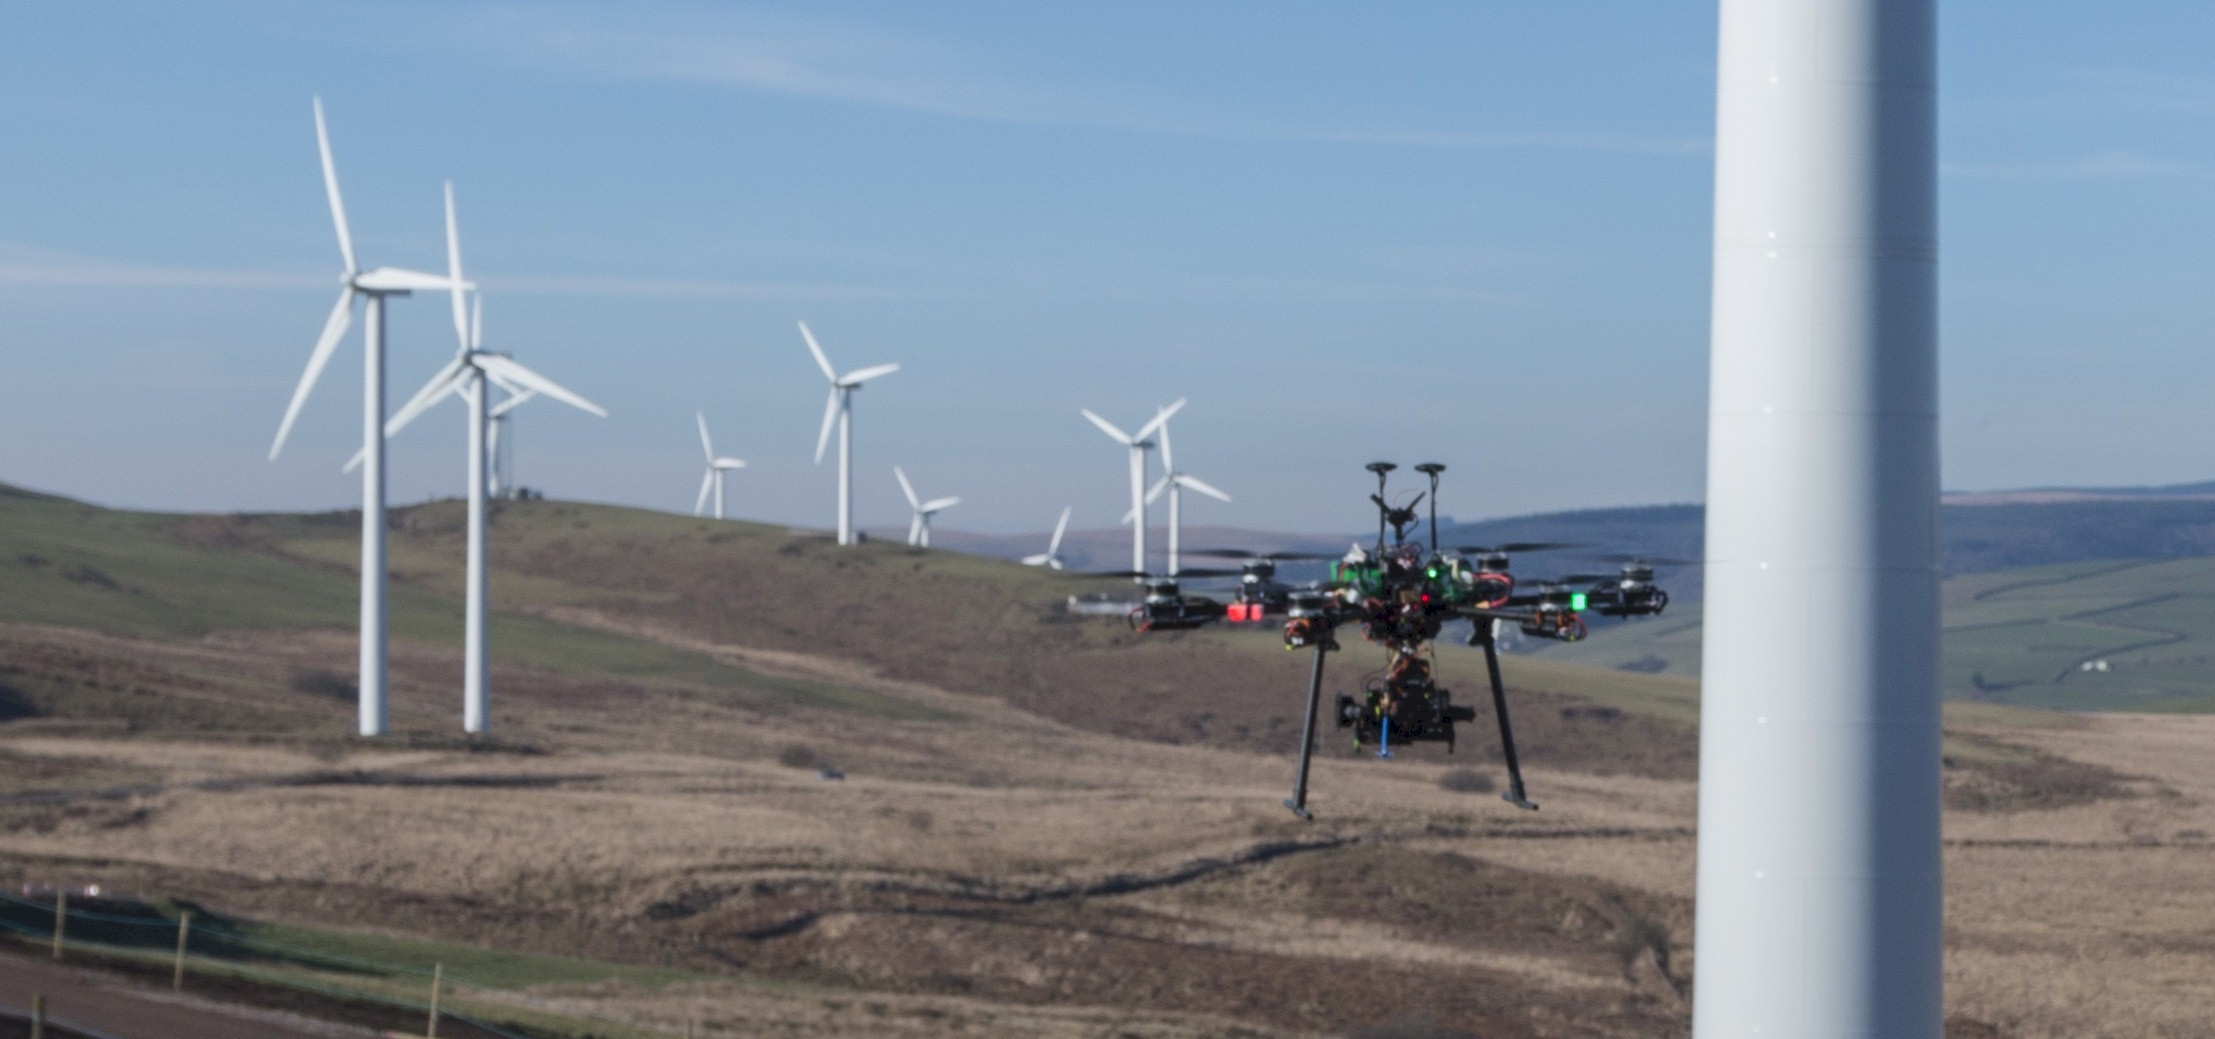 Windfarm Inspections & Surveys